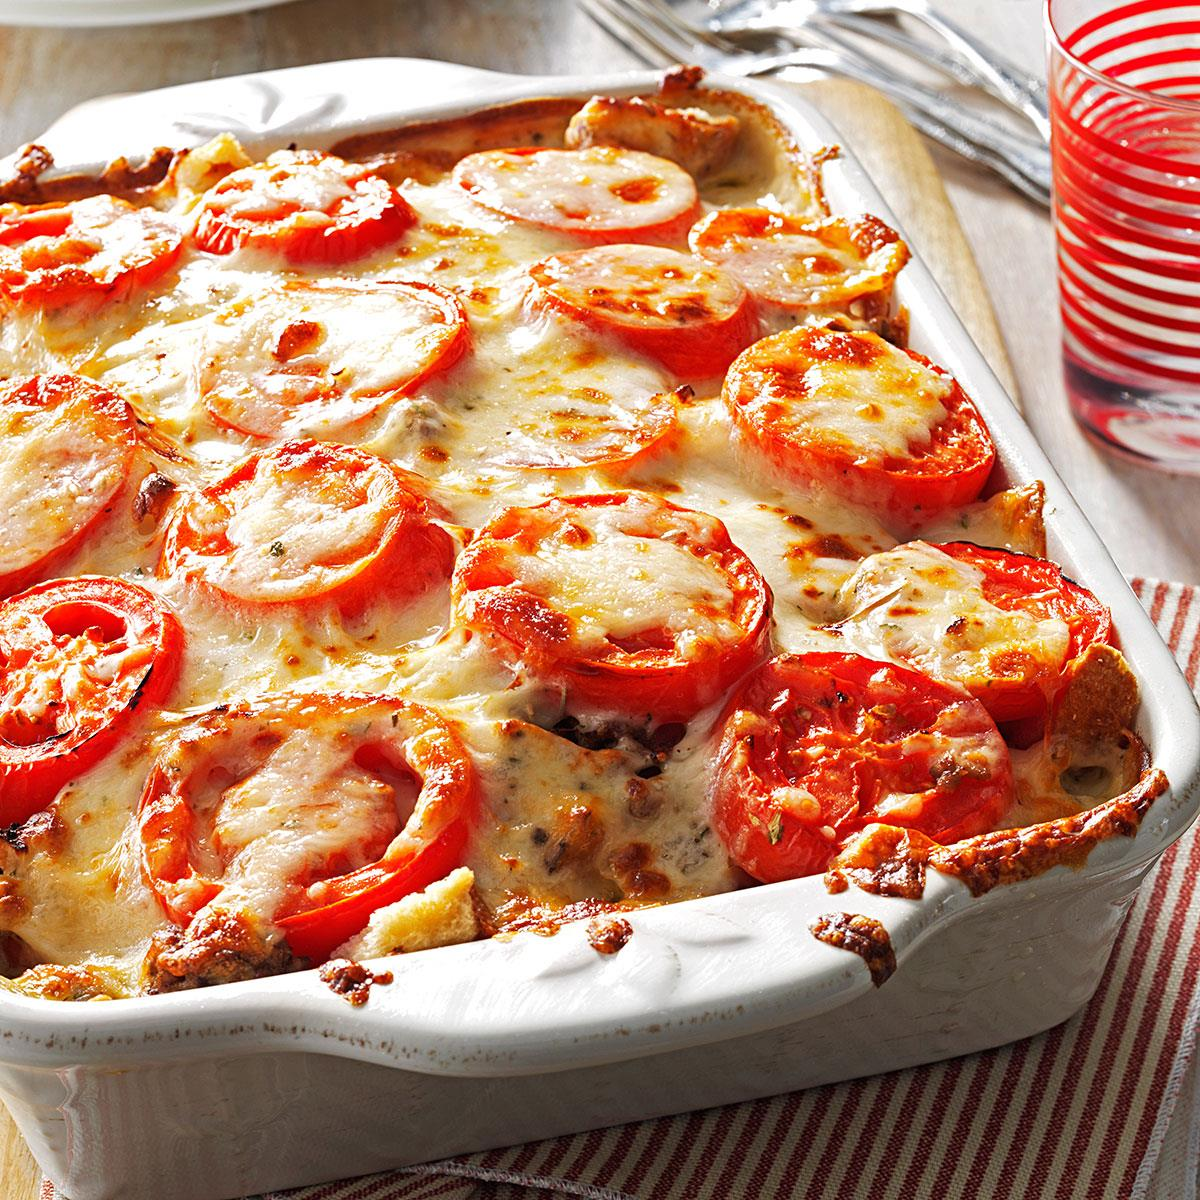 tomato french bread lasagna recipe taste of home. Black Bedroom Furniture Sets. Home Design Ideas